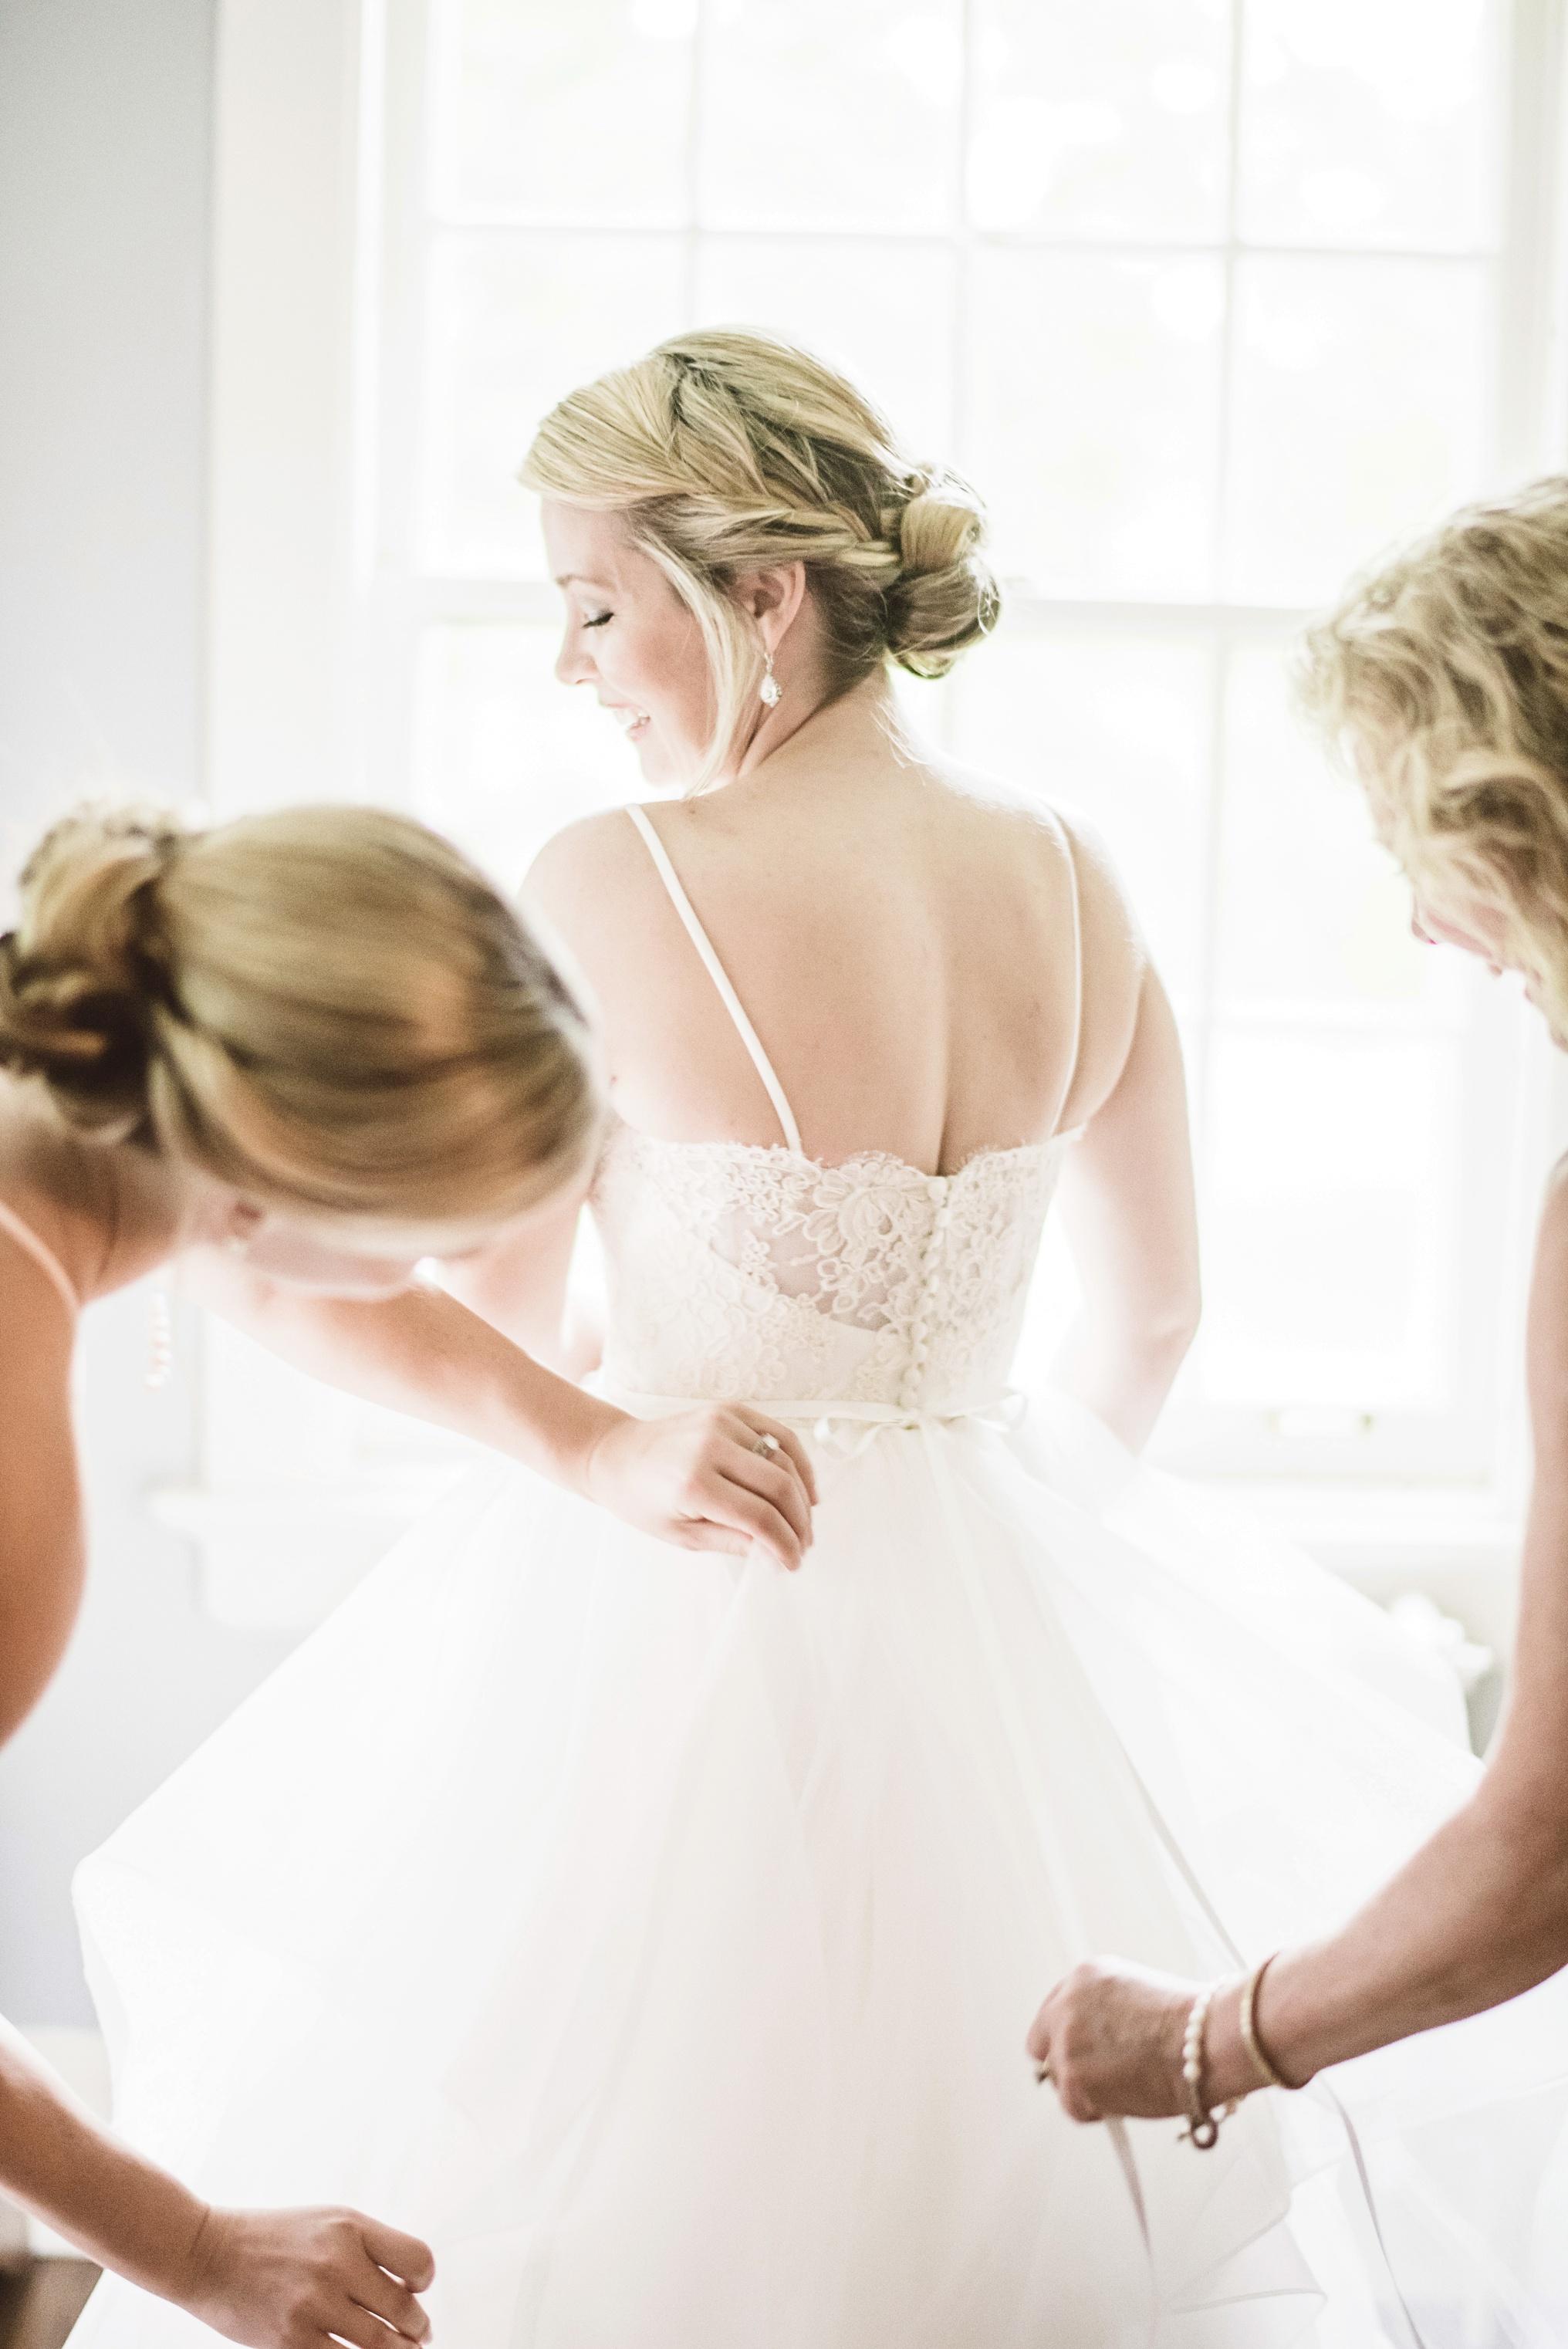 best_wedding_photography_2017_by_lucas_botz_photography_232.jpg